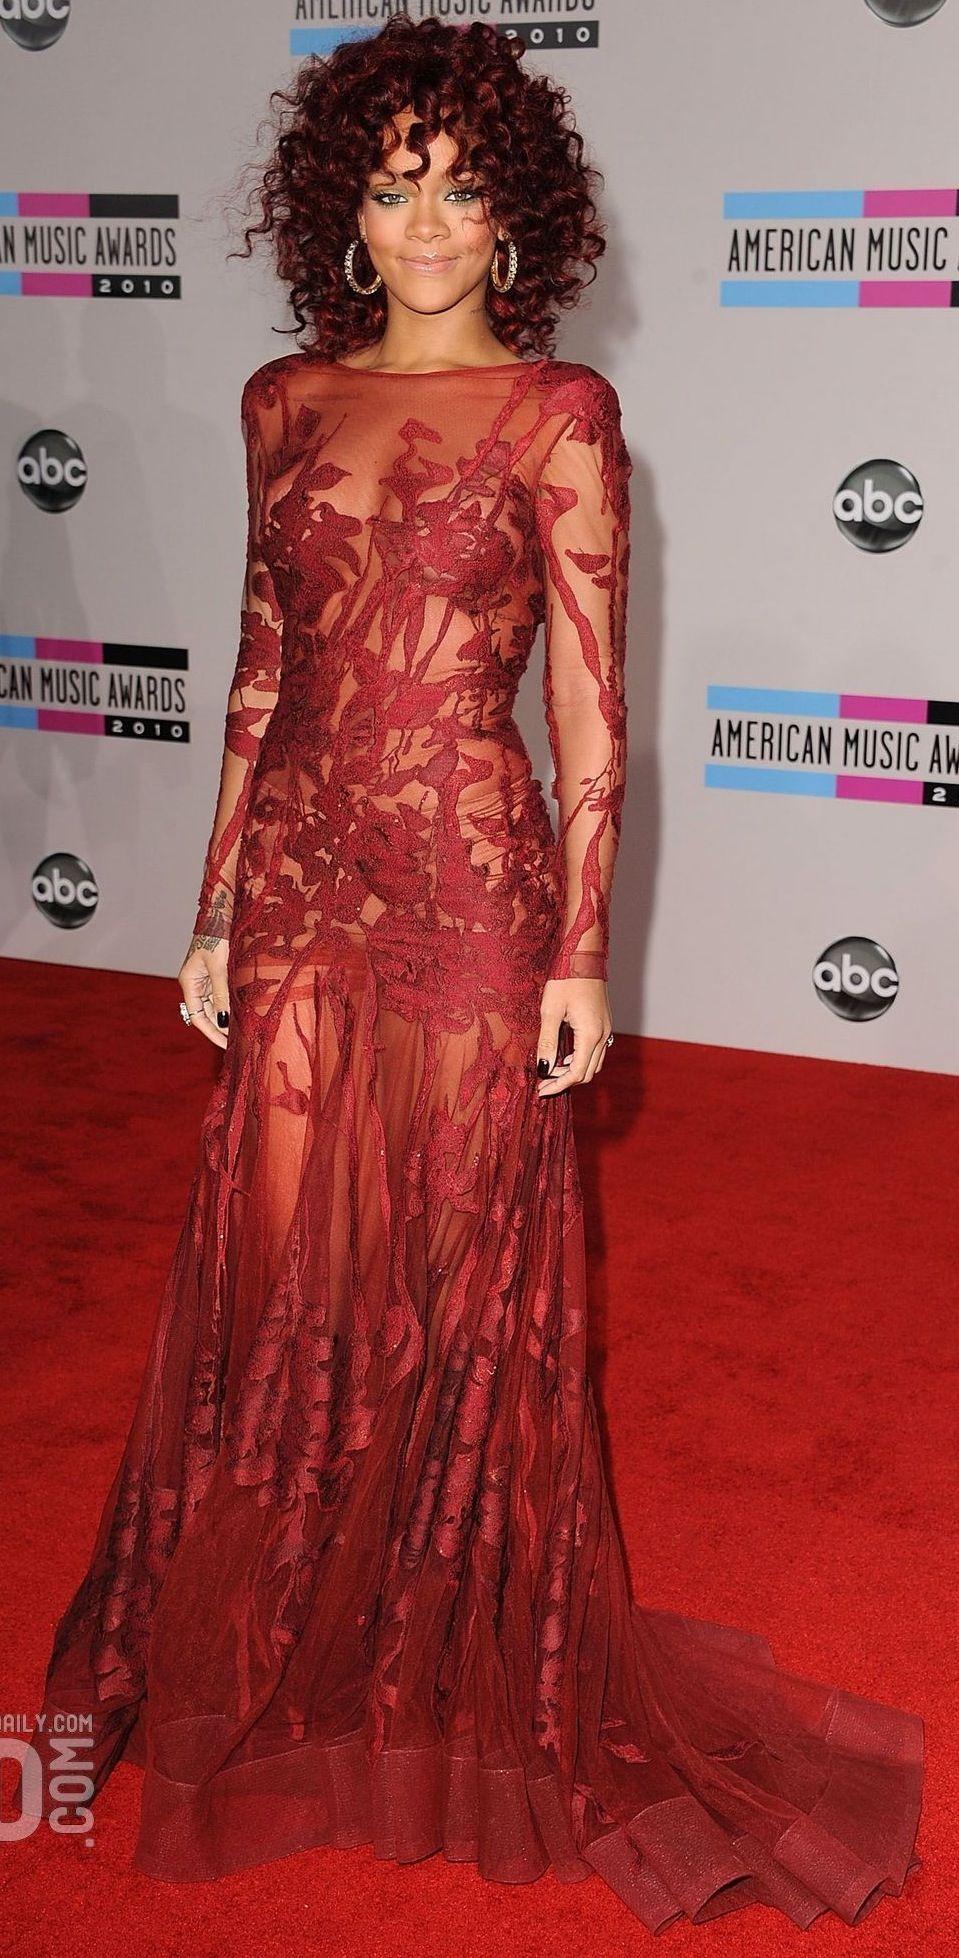 Rihanna #HauteCouture #RedCarpet   Dreamy dresses   Pinterest ...